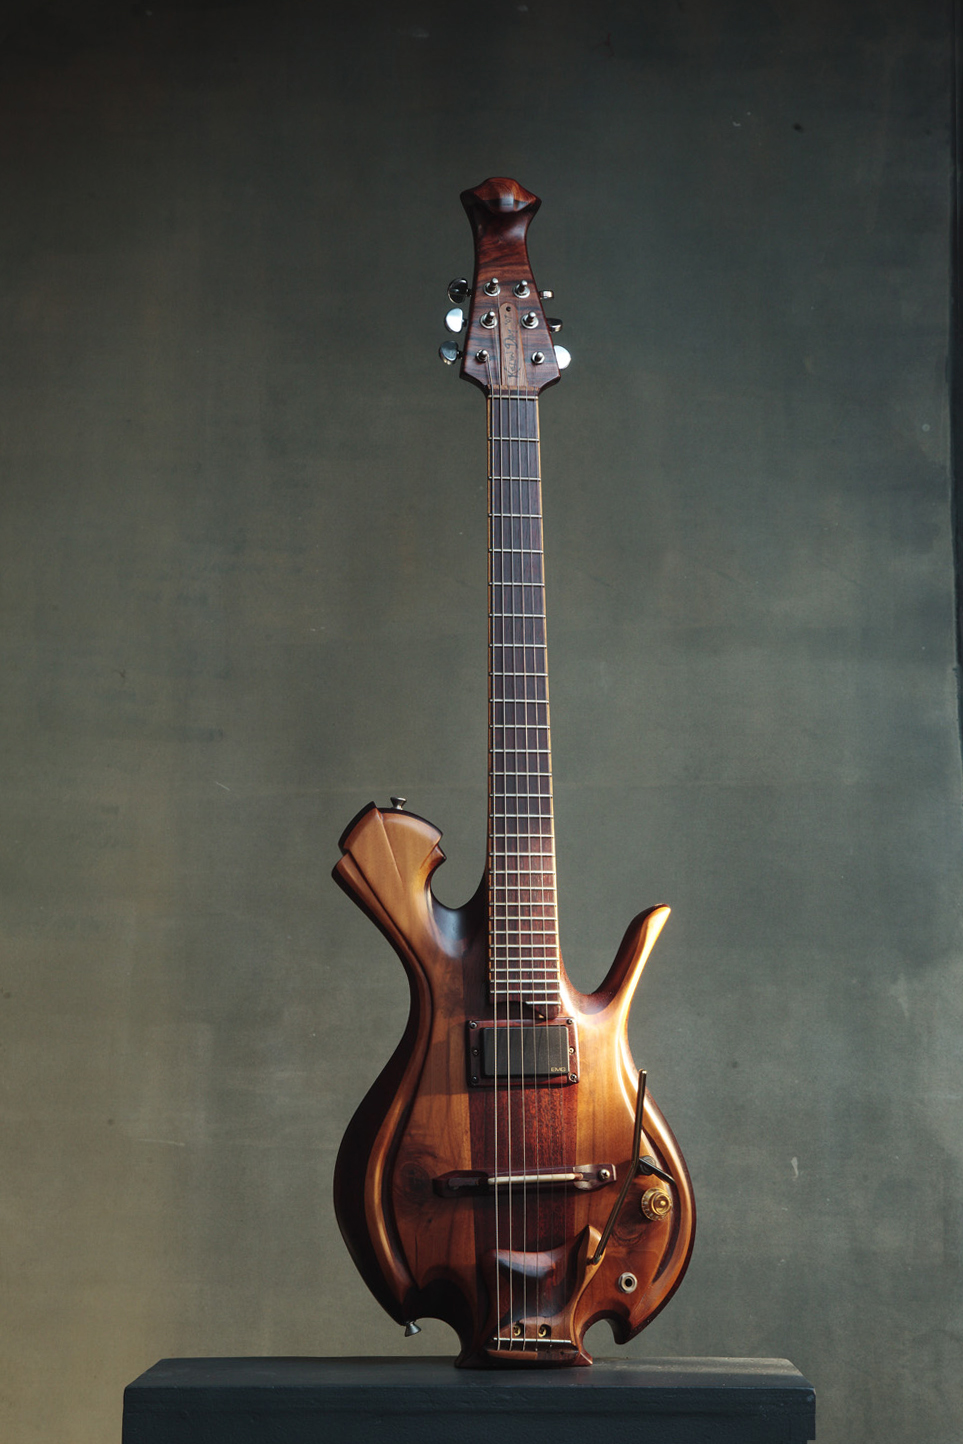 6-STRING GUITAR I